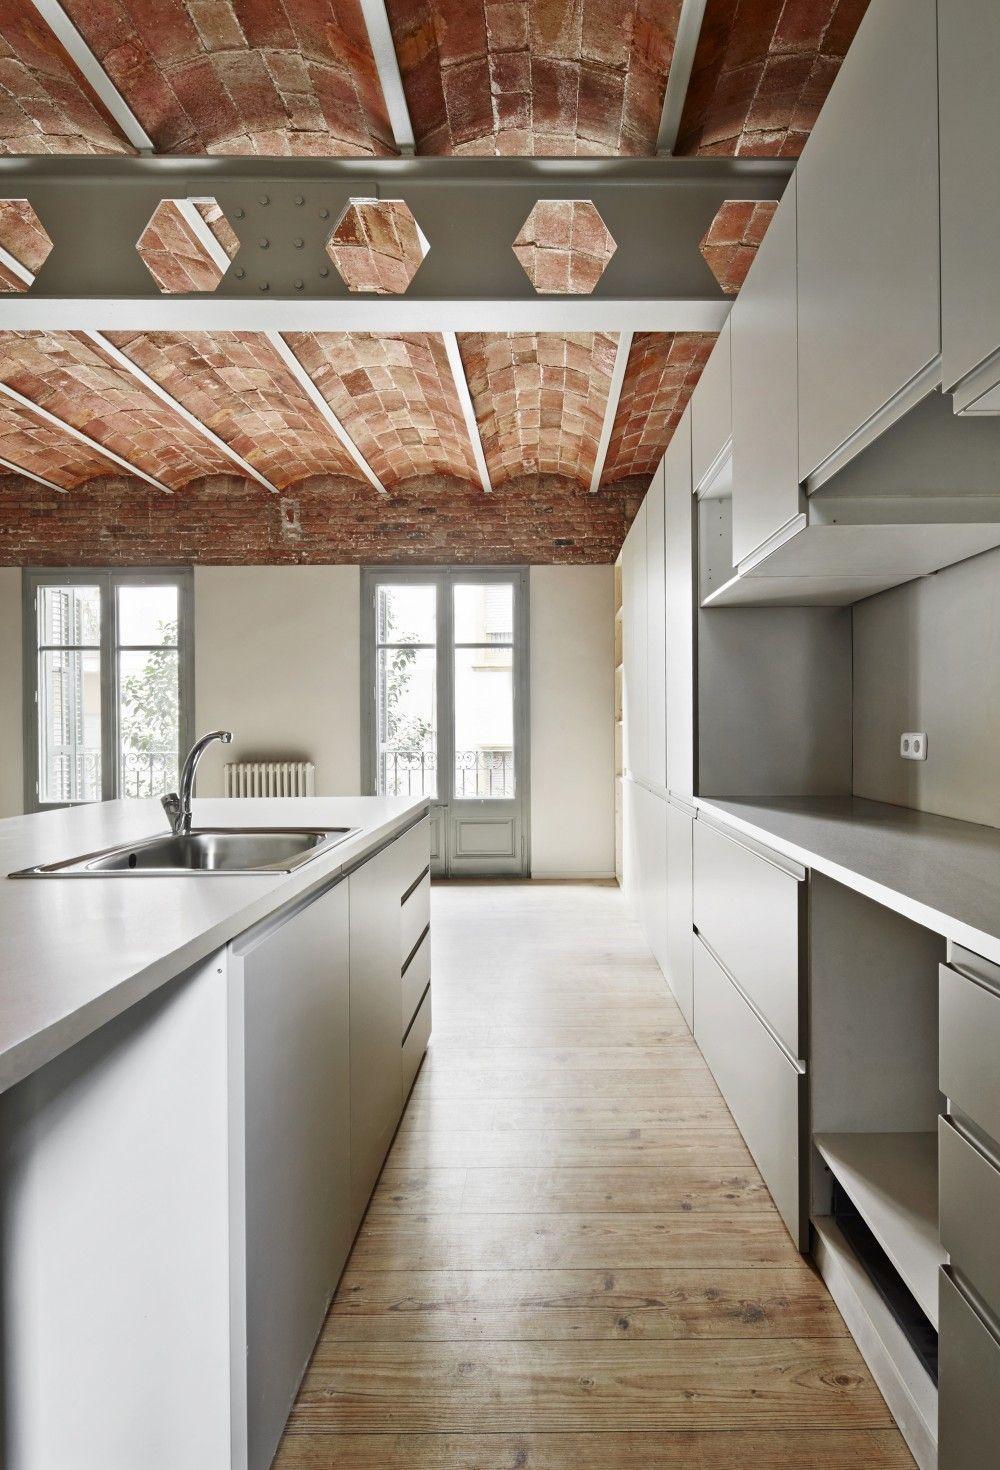 Galer A De Casa Tom S Lab Pepe Gascon 11 Plataforma  # Muebles De Casa Barcelona